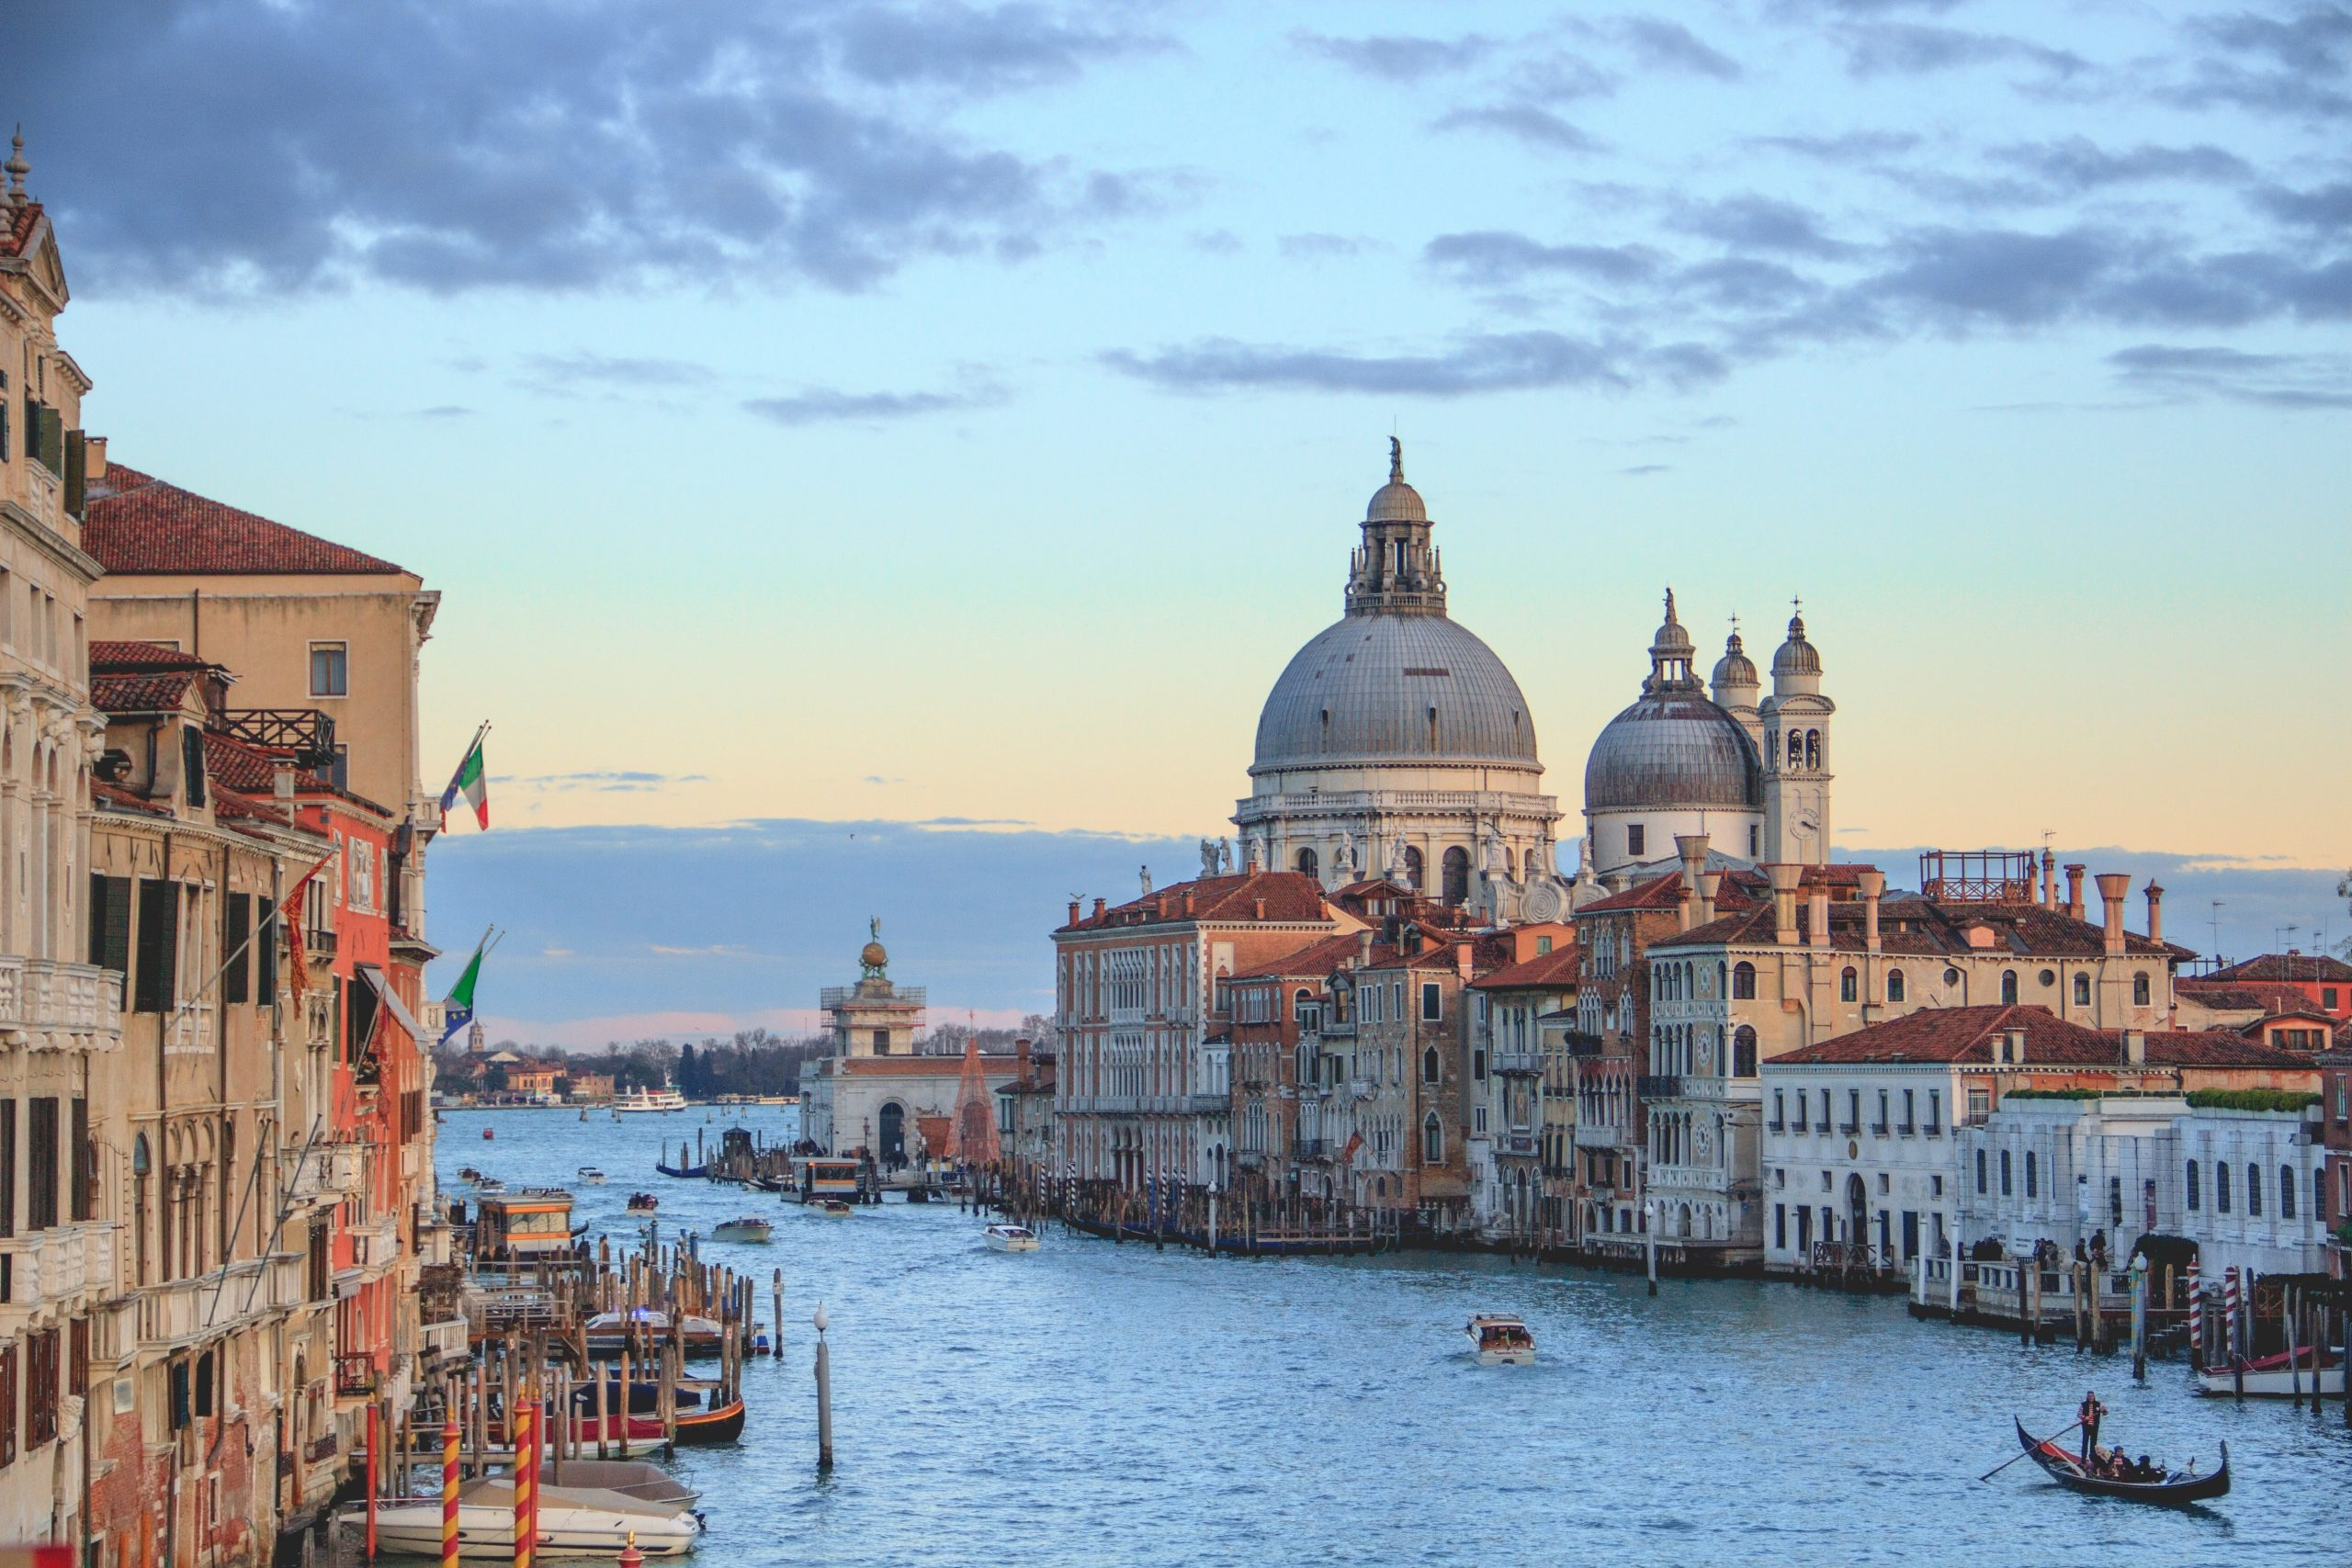 5 ways to say how in Italian